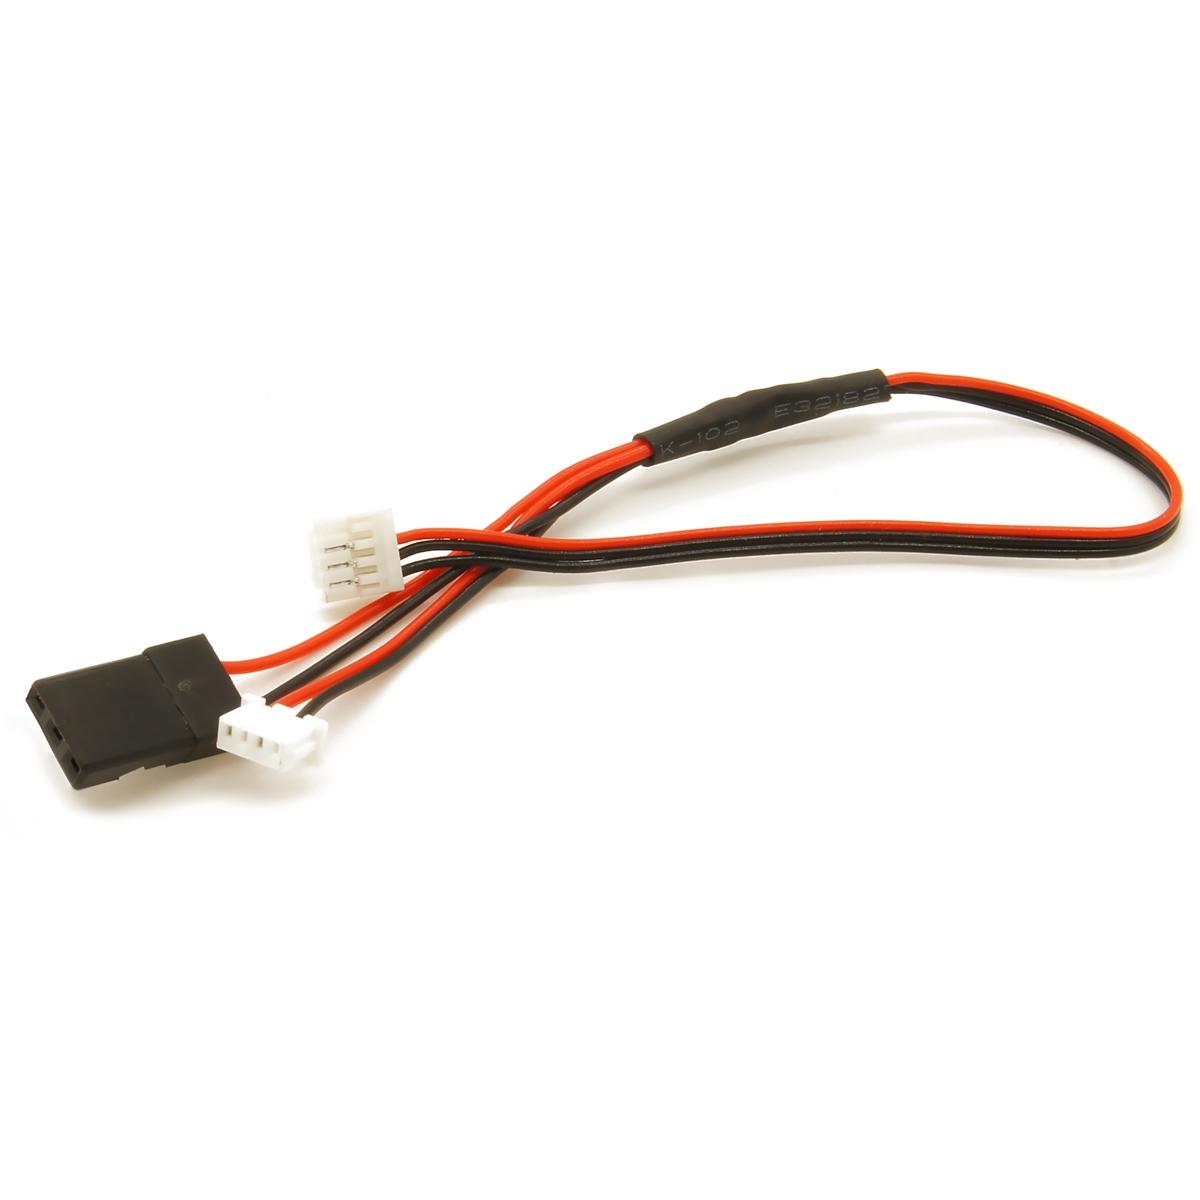 Mro 4 Pins Jst Gh To Molex Picoblade 51021 And Jr Servo Pin Wiring Diagram Female Mrc0219